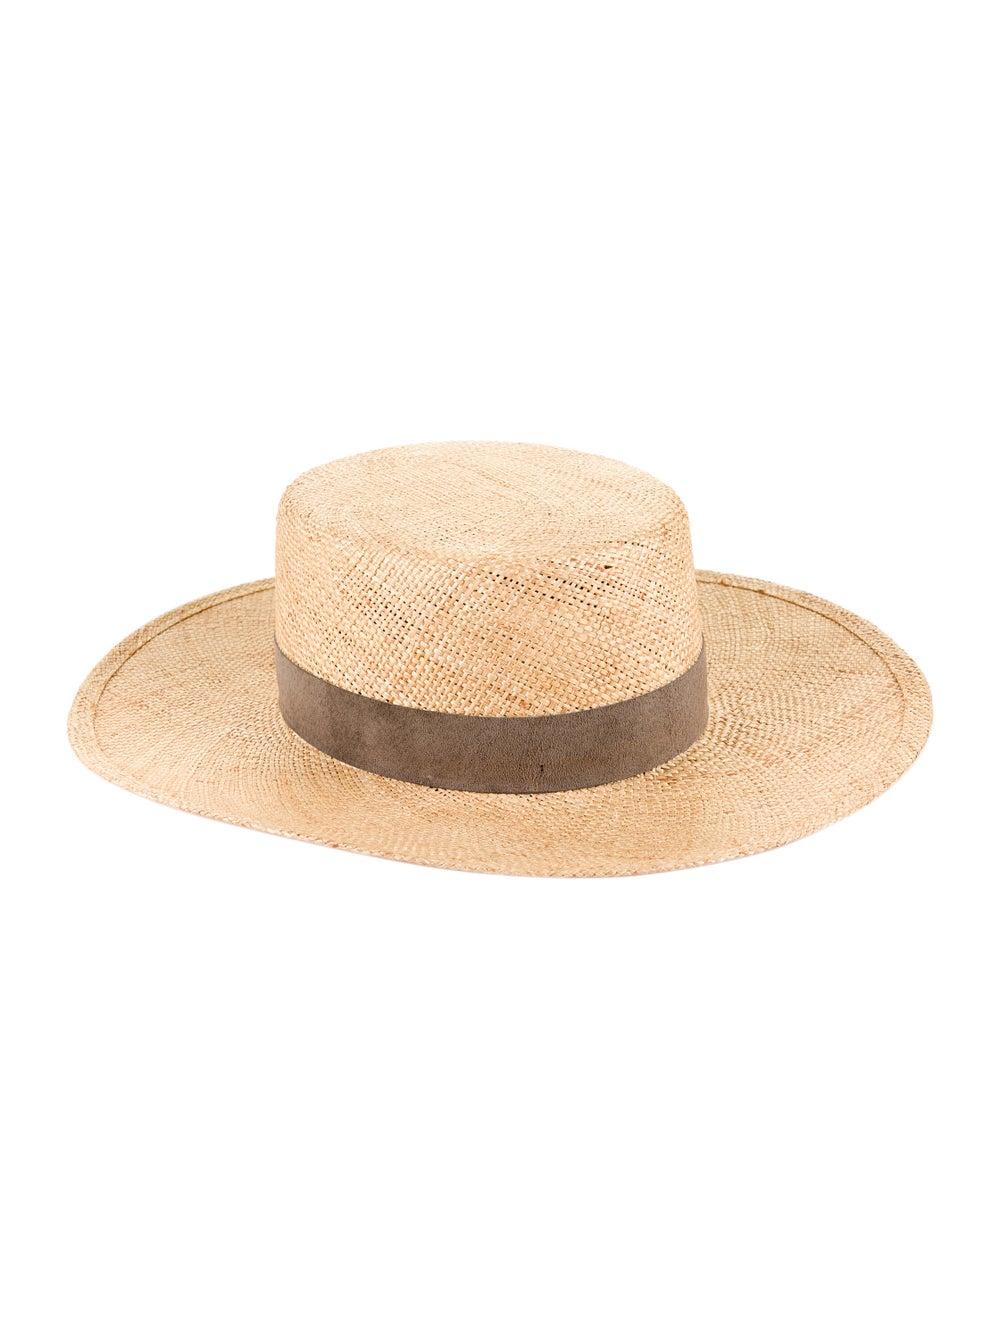 Janessa Leone Wide Brim Straw Hat yellow - image 1